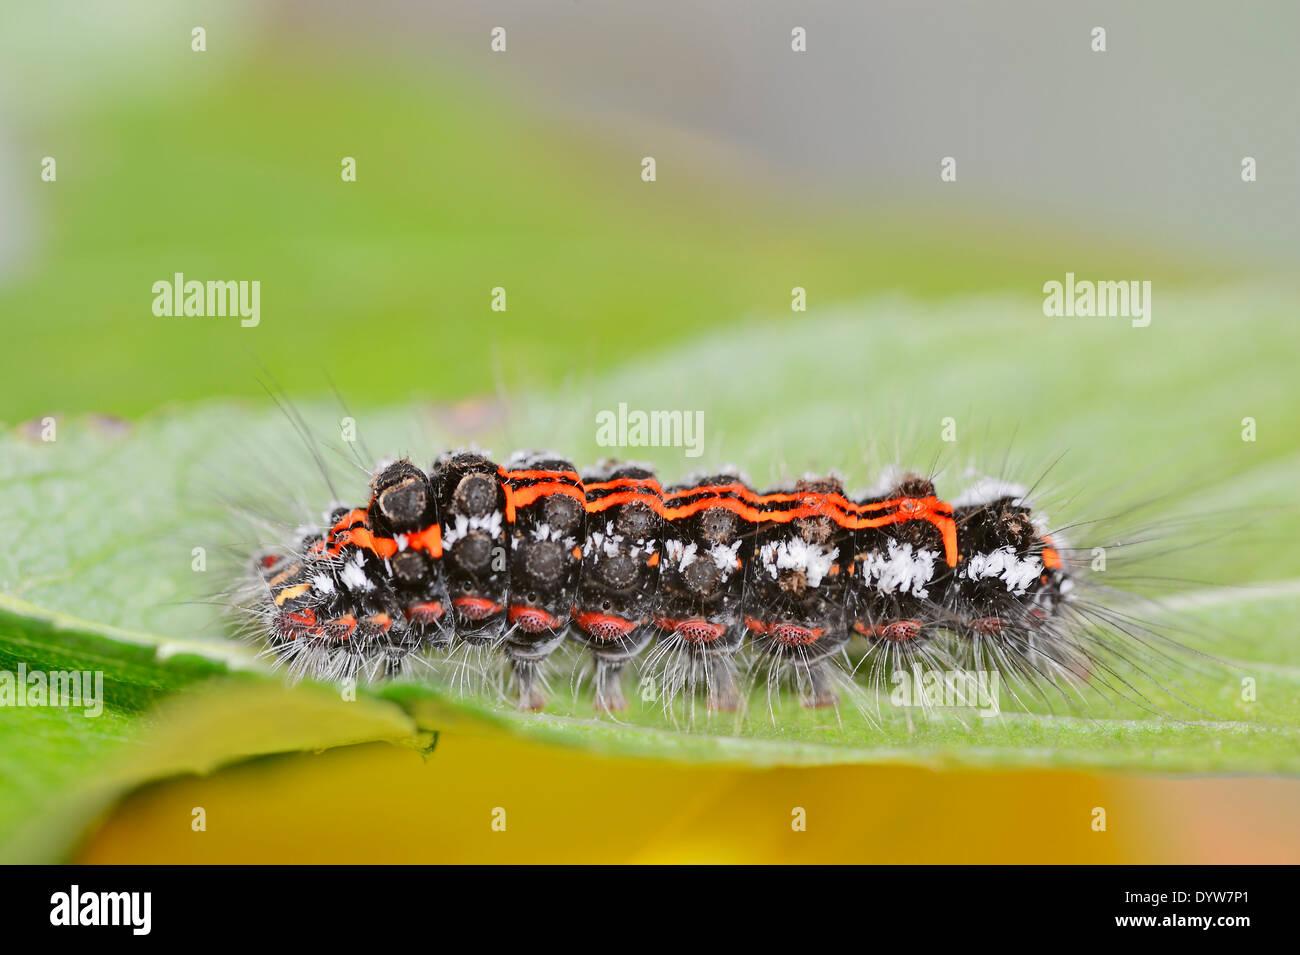 Gelb-Tail Motte, Goldtail Motte oder Swan Moth (Euproctis Similis), Raupe, North Rhine-Westphalia, Deutschland Stockbild